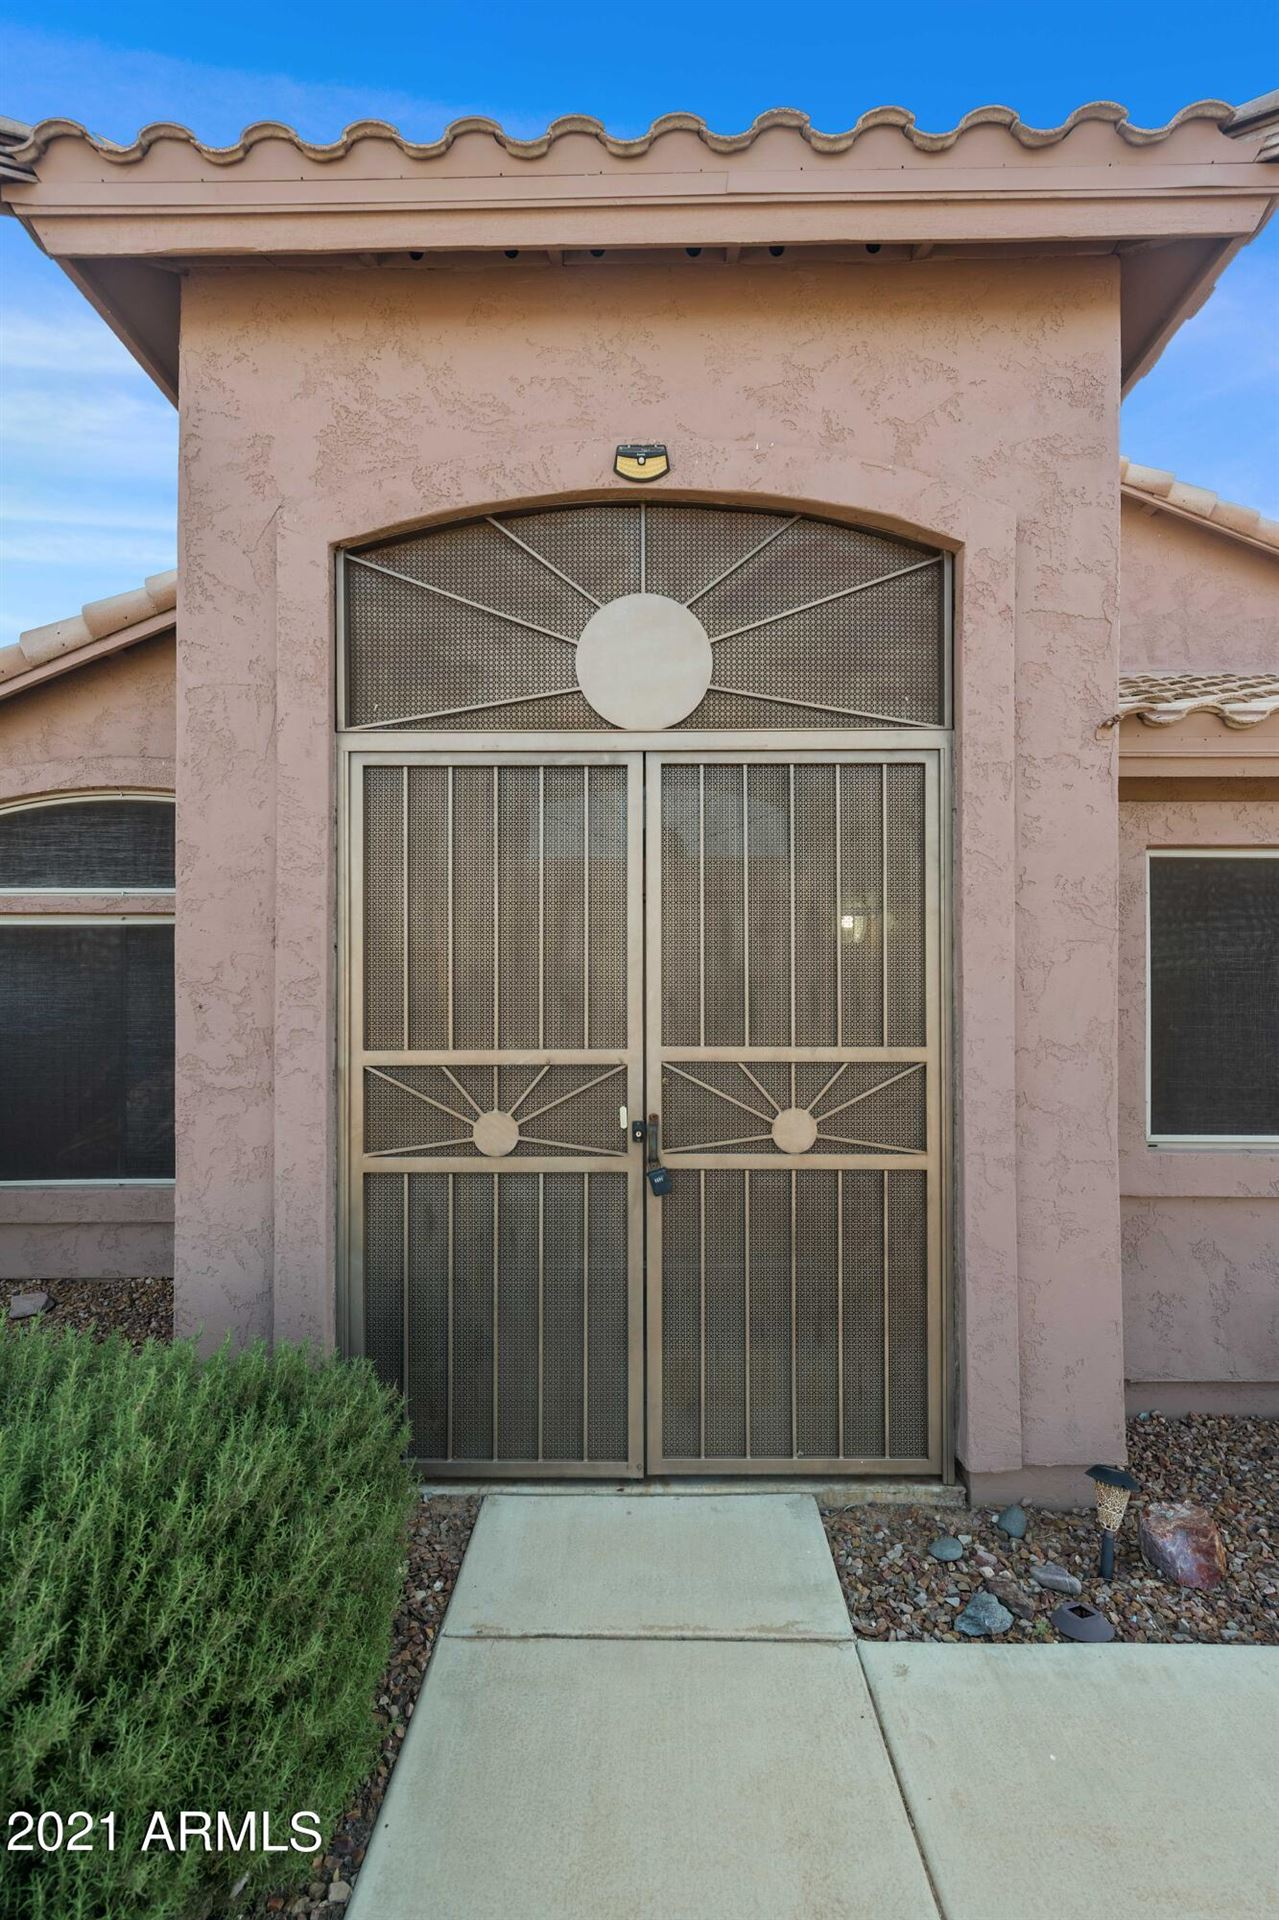 Photo of 885 N ROADRUNNER Road, Apache Junction, AZ 85119 (MLS # 6278195)